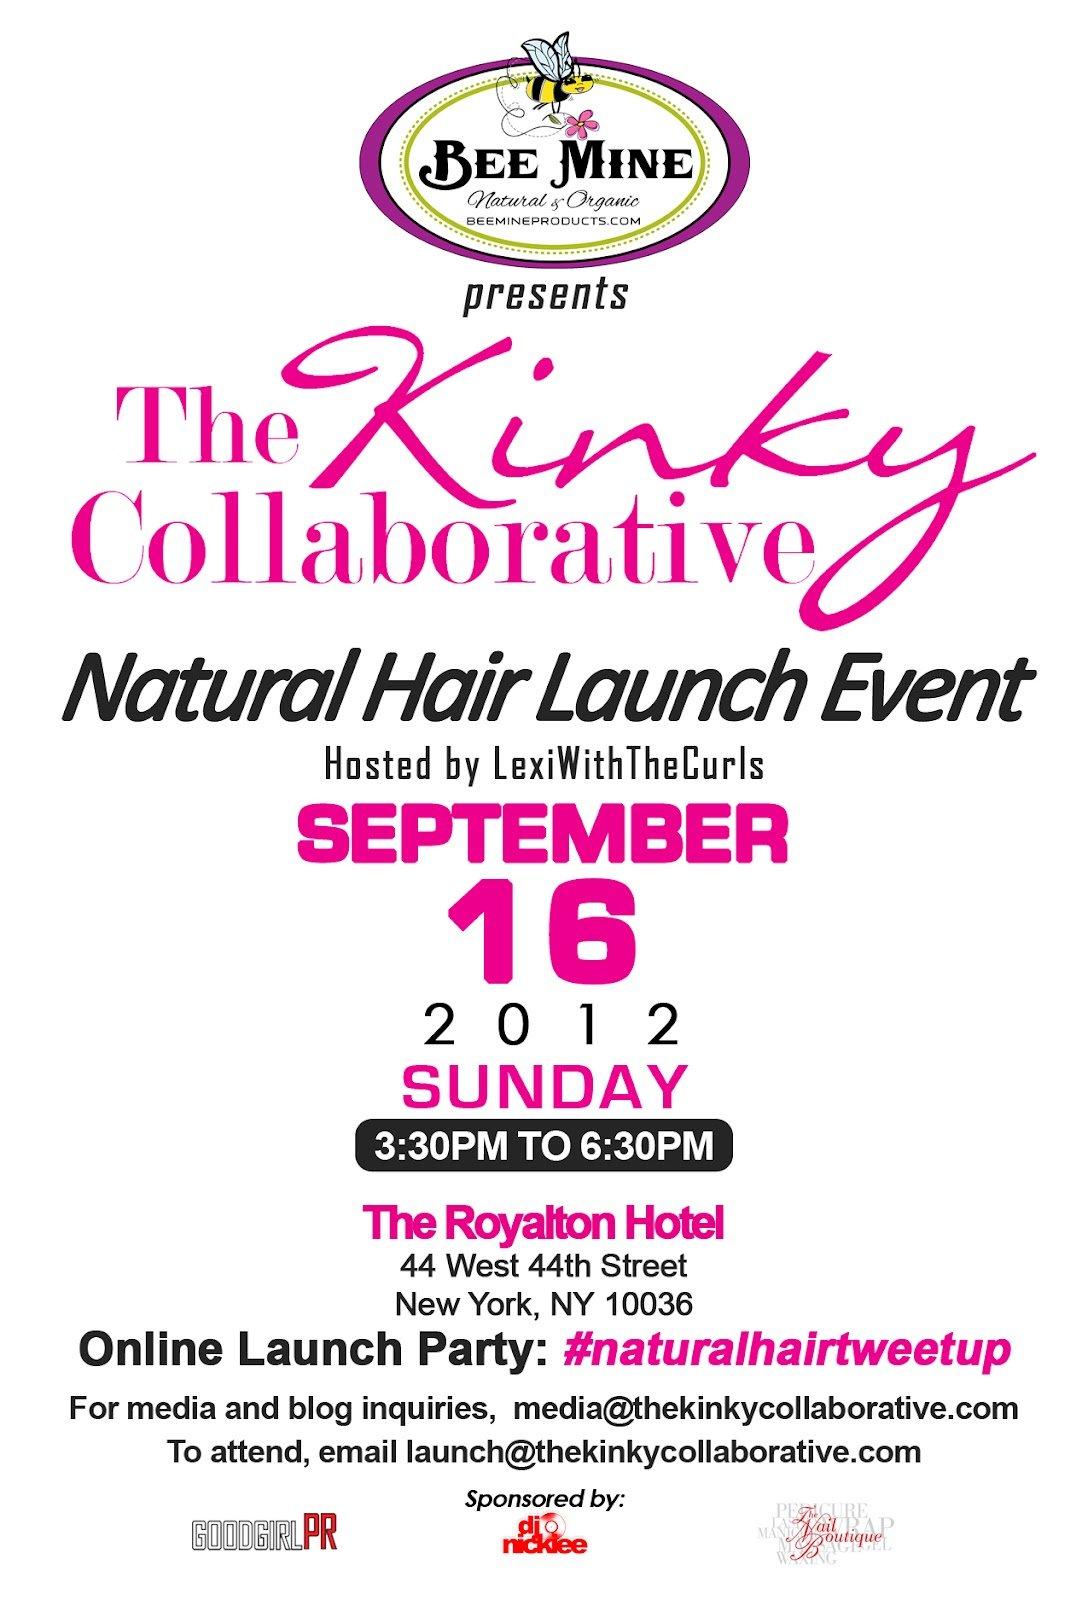 The Kinky Collaborative!